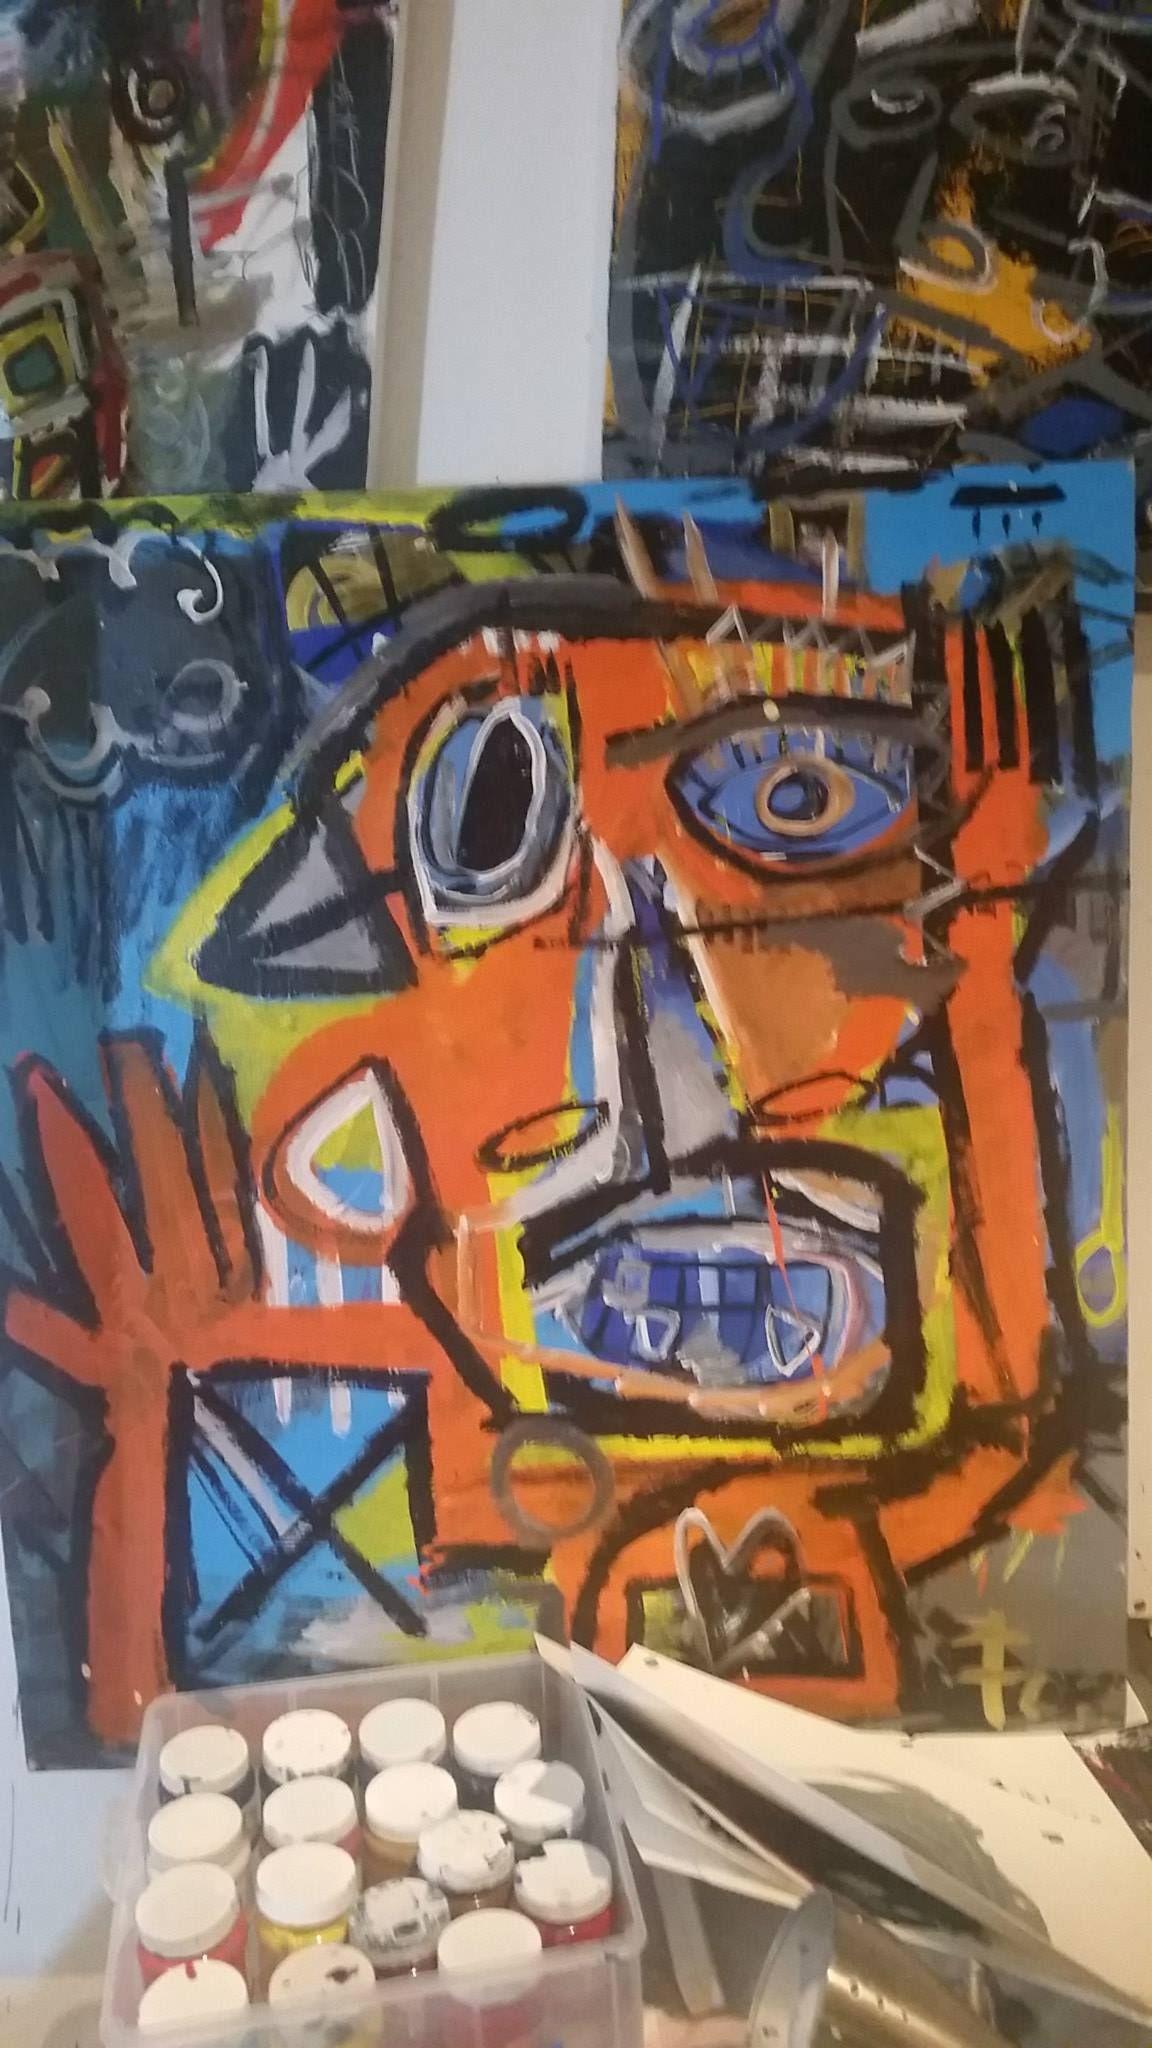 Artist Rothman / Title / Dimensions 80 X 100 cm